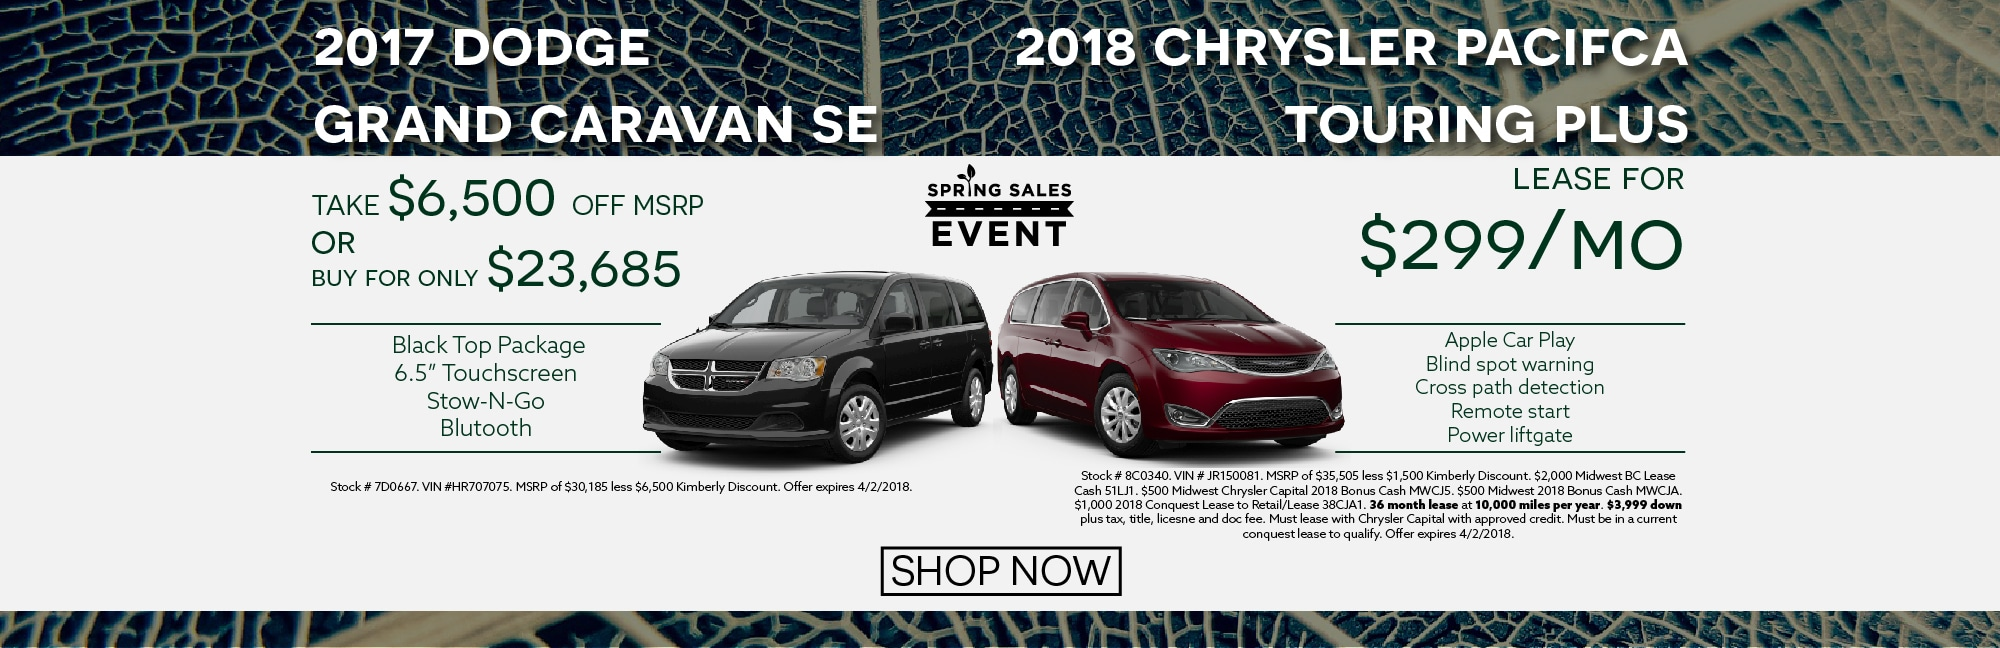 Davenport Chrysler, Dodge, Ram, Jeep Dealership | Kimberly ...